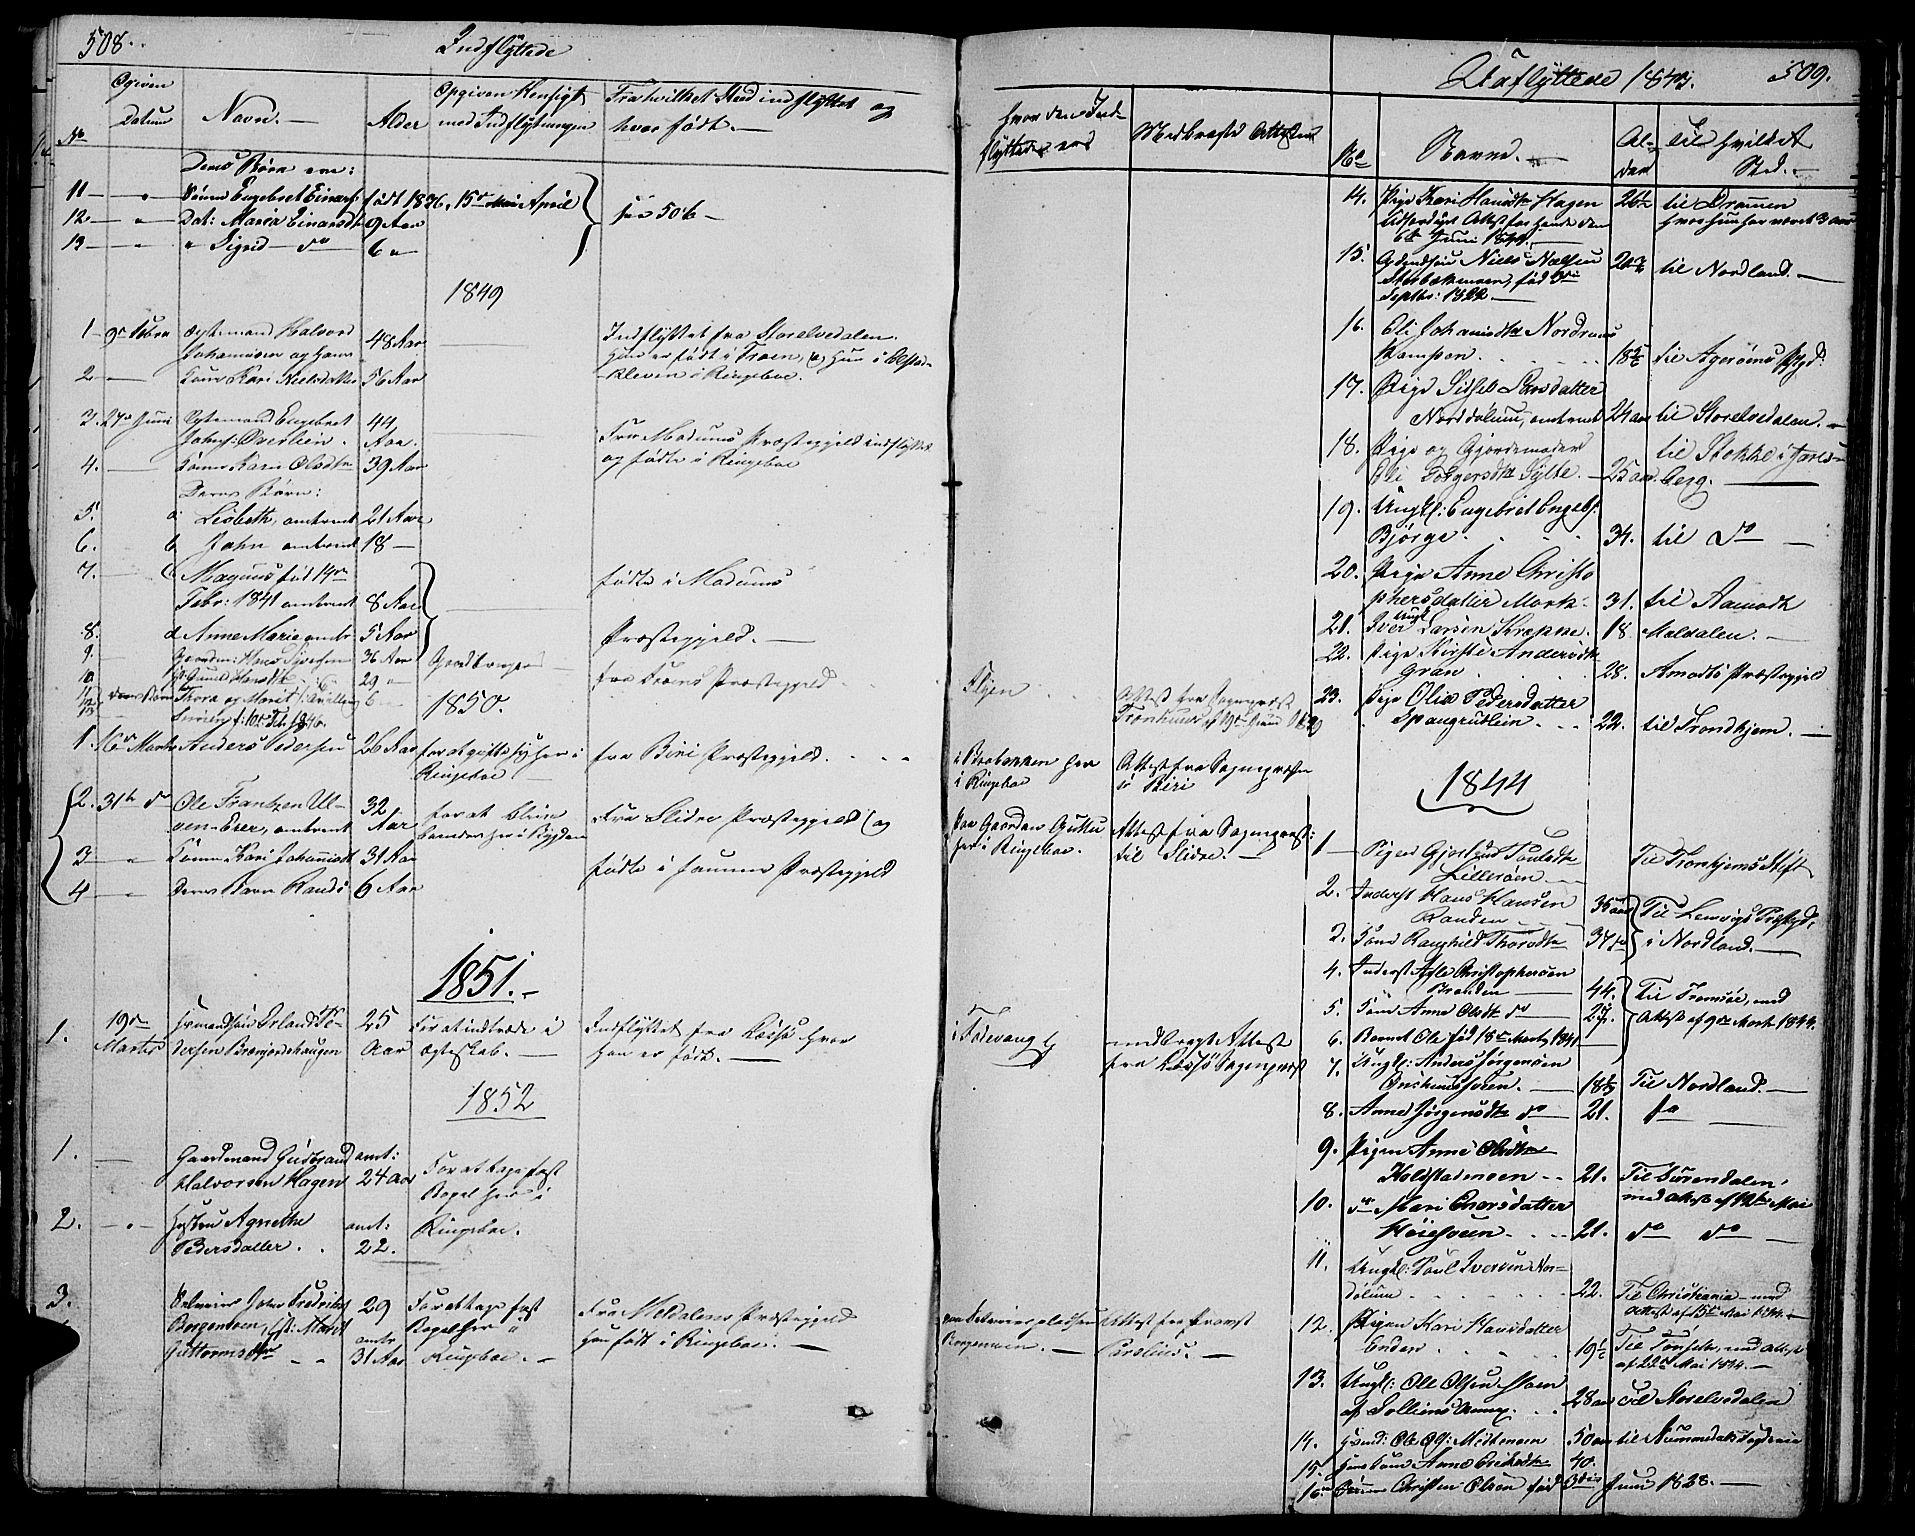 SAH, Ringebu prestekontor, Klokkerbok nr. 2, 1839-1853, s. 508-509